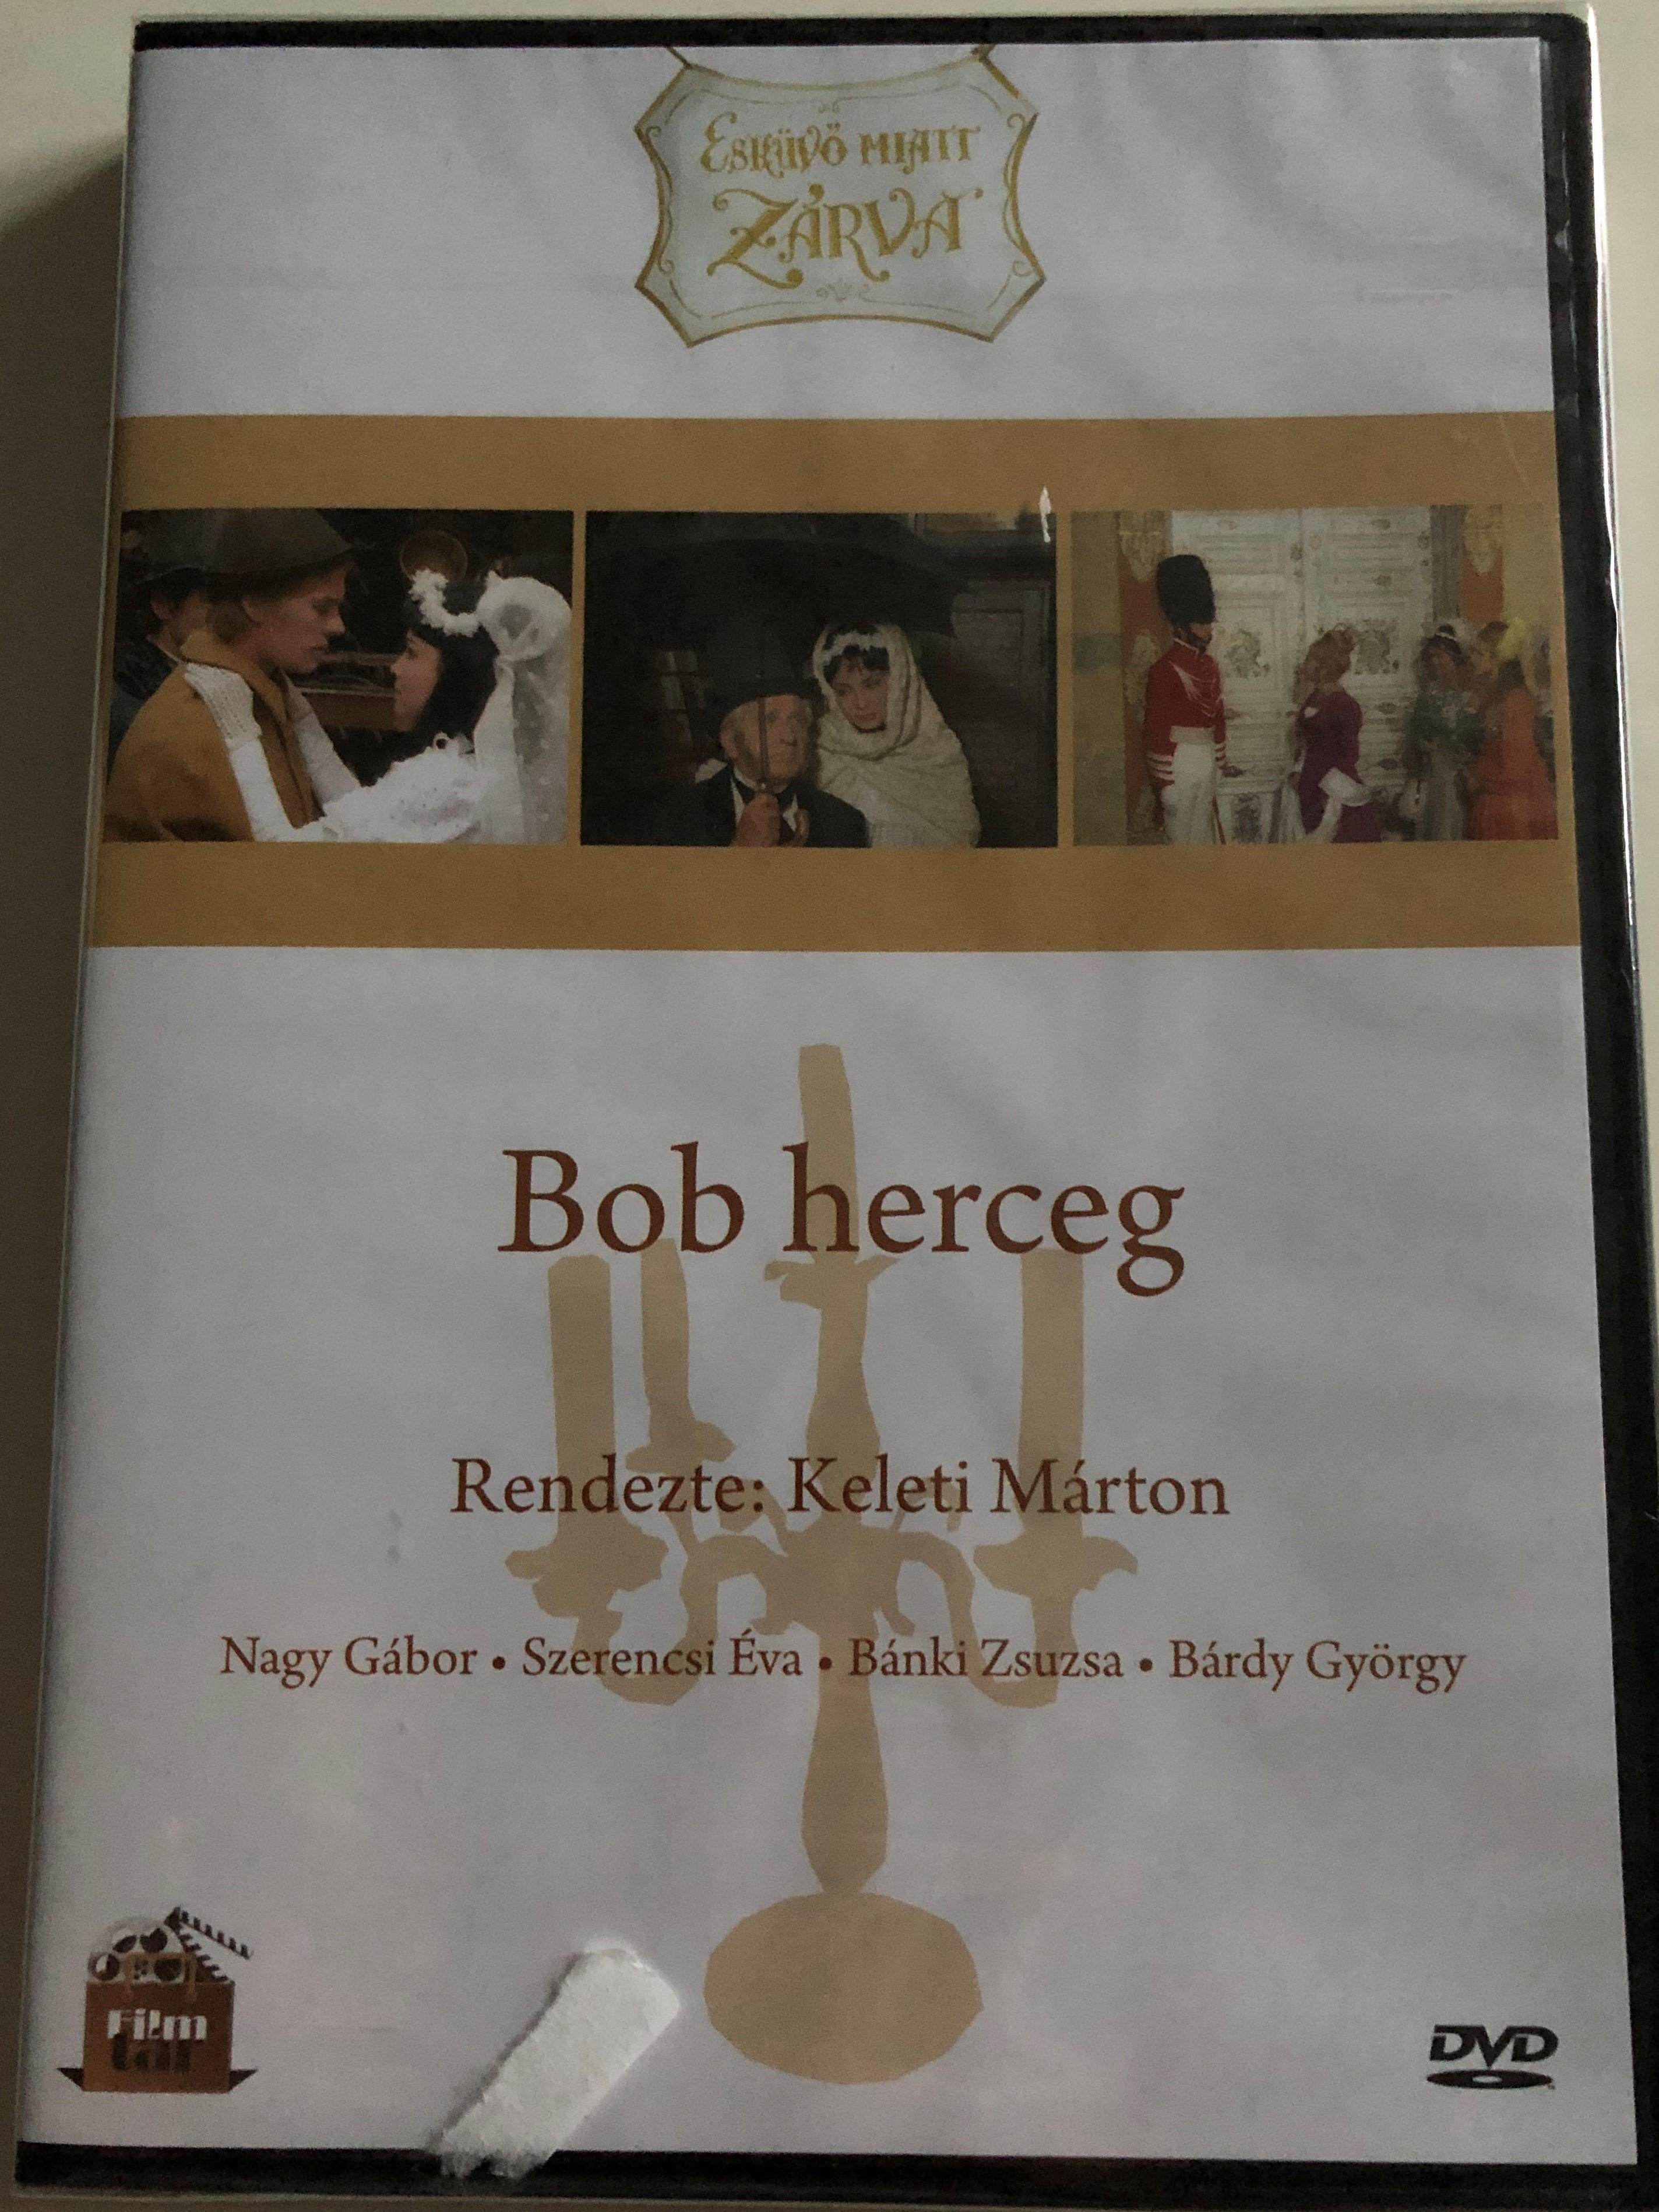 -prince-bob-dvd-1972-bob-herceg-hungarian-operetta-directed-by-keleti-m-rton-starring-nagy-g-bor-szerencsi-va-b-nki-zsuzsa-b-rdi-gy-rgy-tordai-teri-1-.jpg